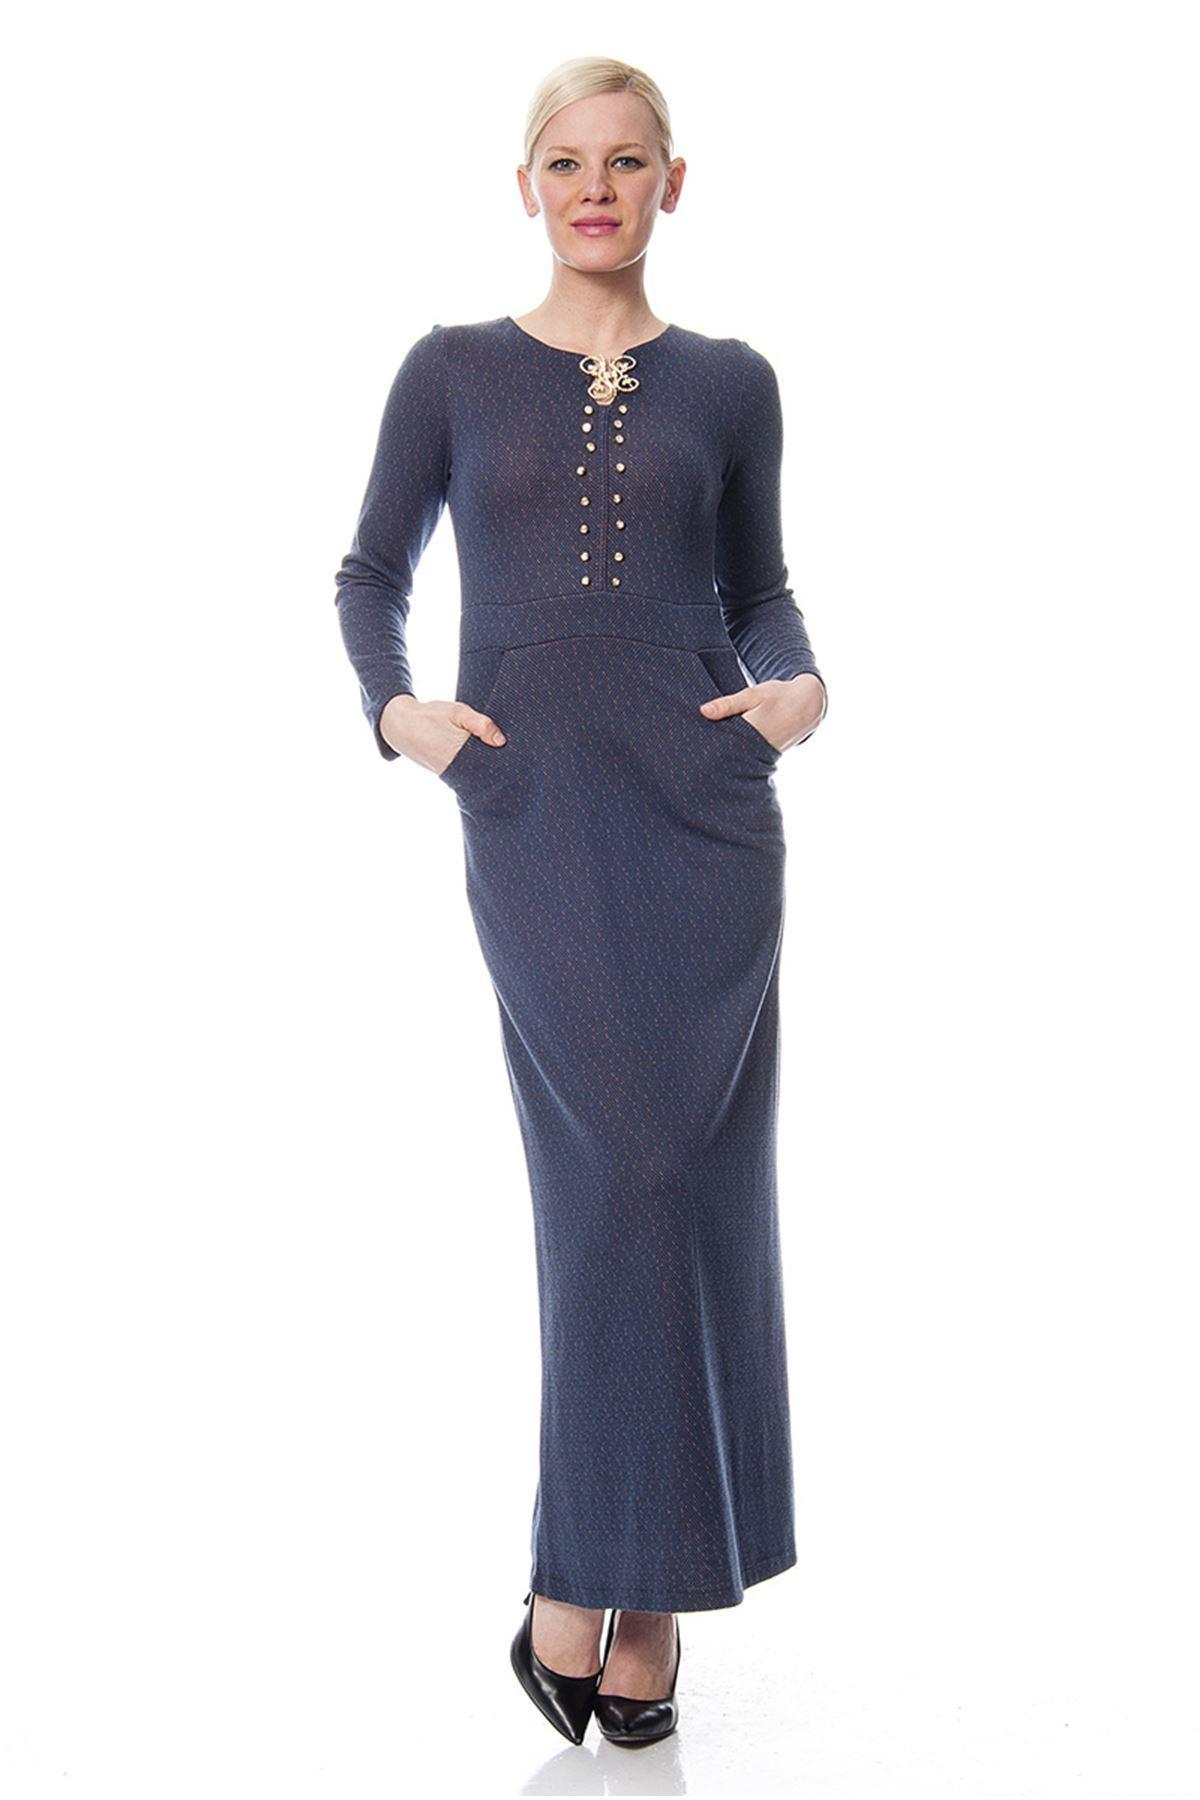 Lacivert Yaka Detaylı Elbise G9-113511